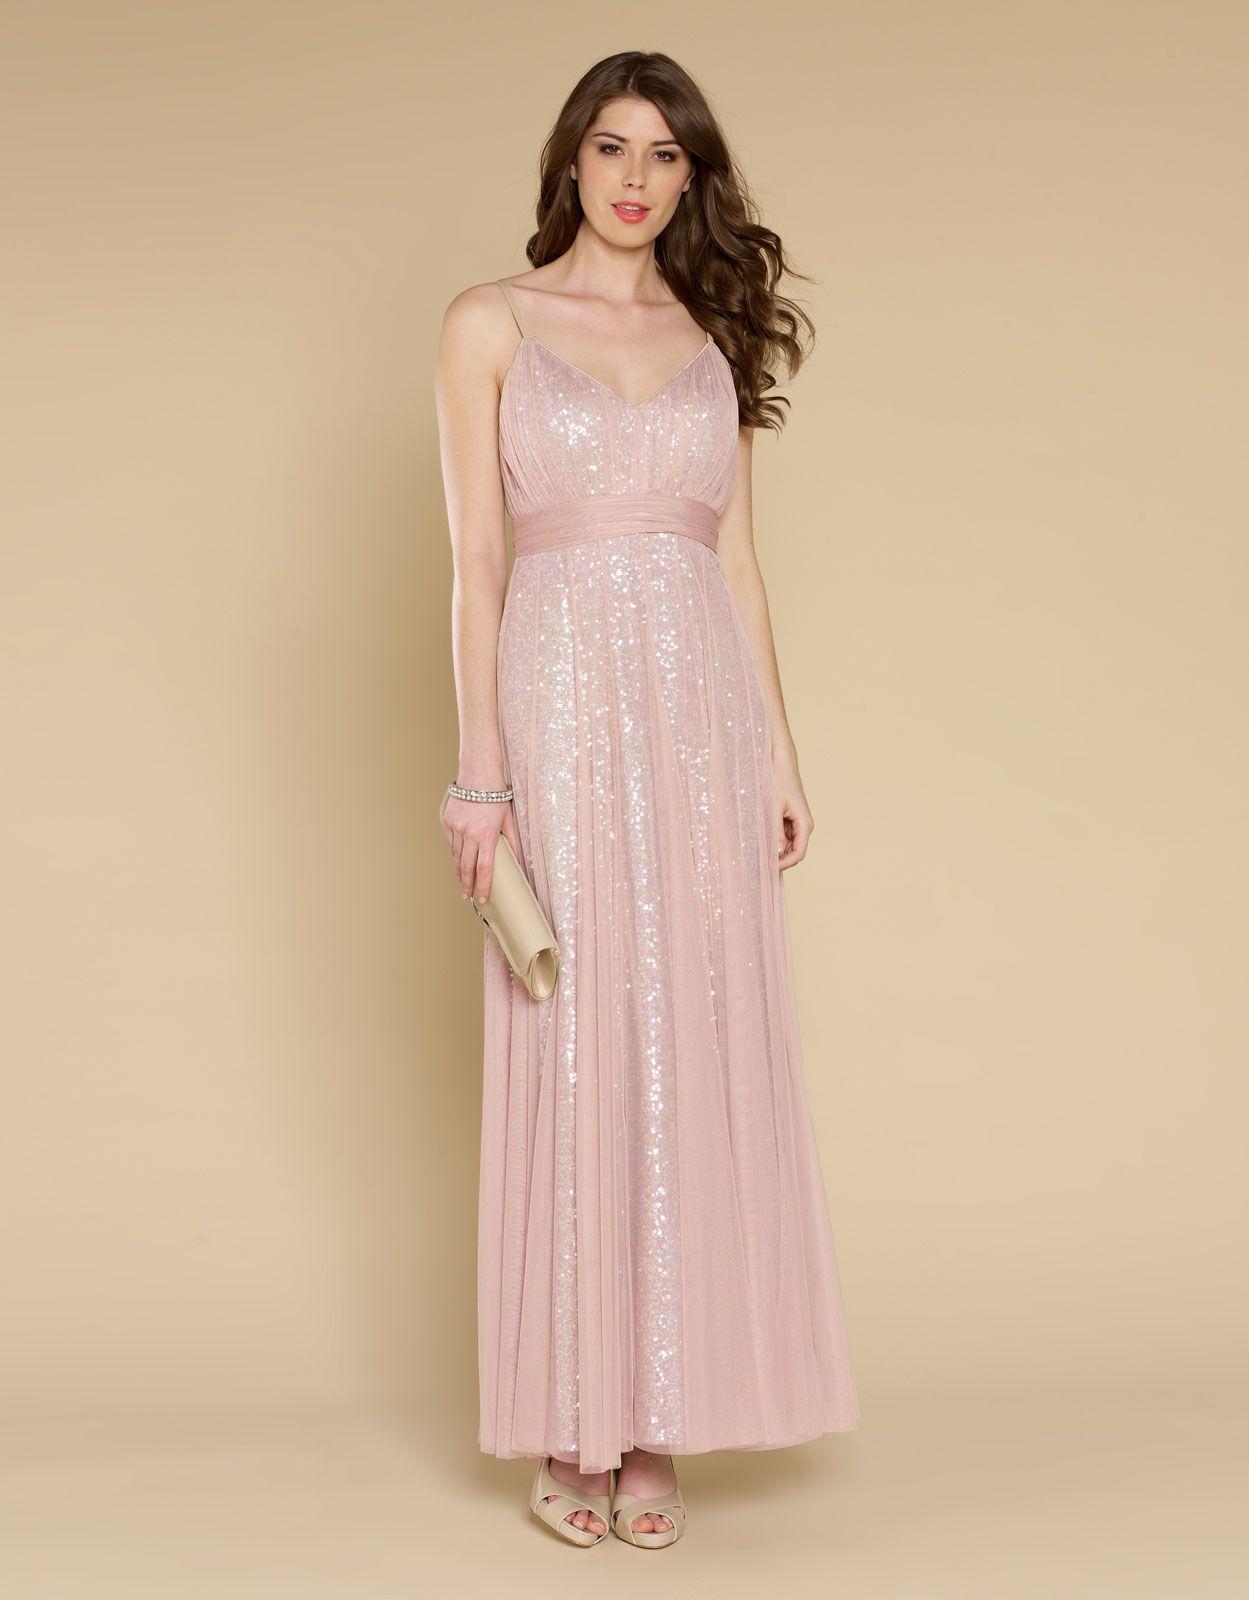 Kate Sequin Maxi Dress | Nude | Monsoon | Wedding Bridesmaids ...